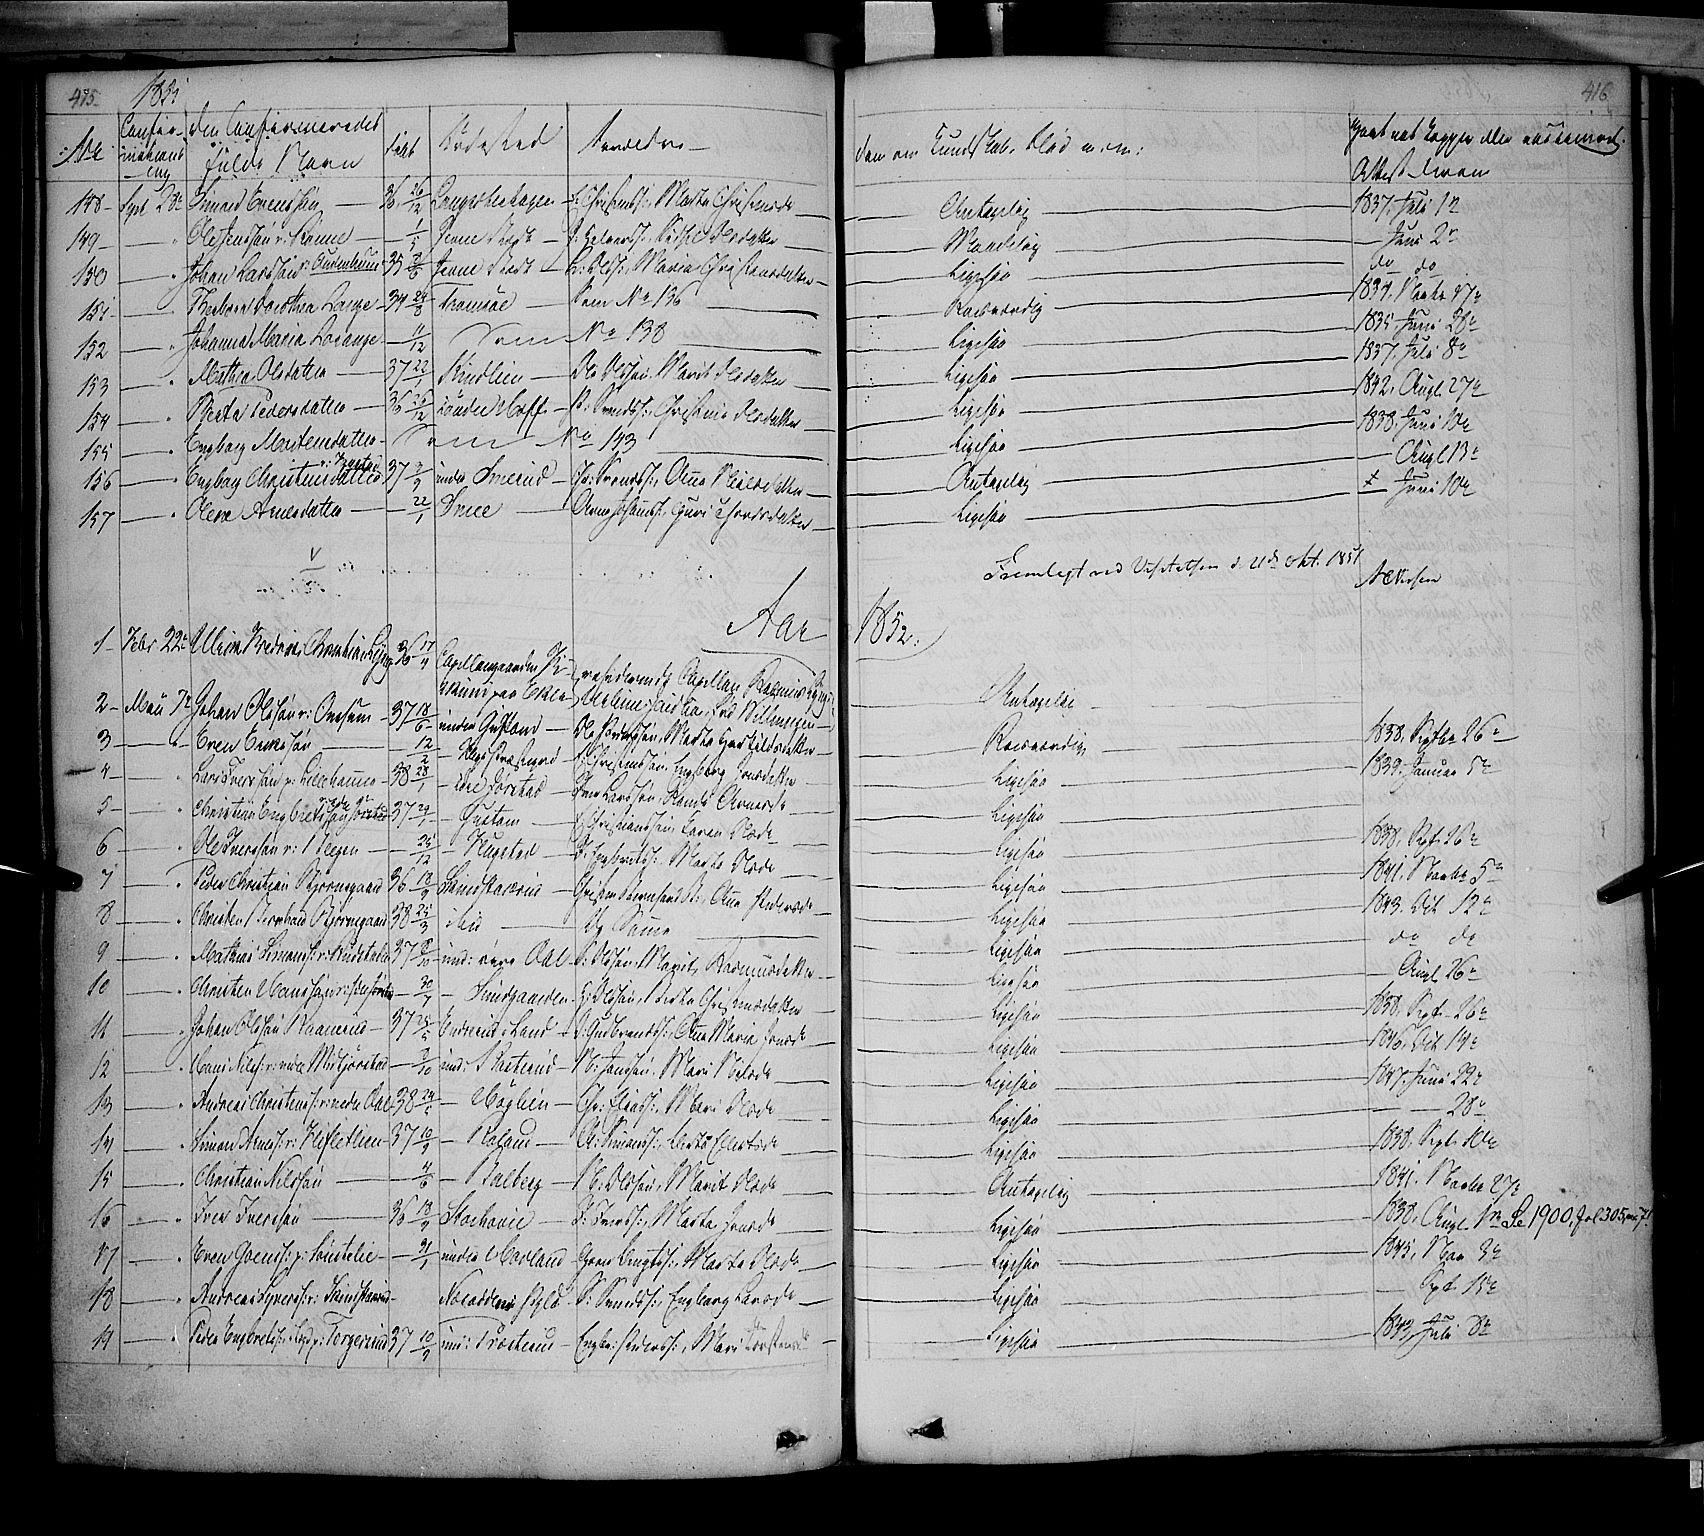 SAH, Fåberg prestekontor, Ministerialbok nr. 5, 1836-1854, s. 415-416